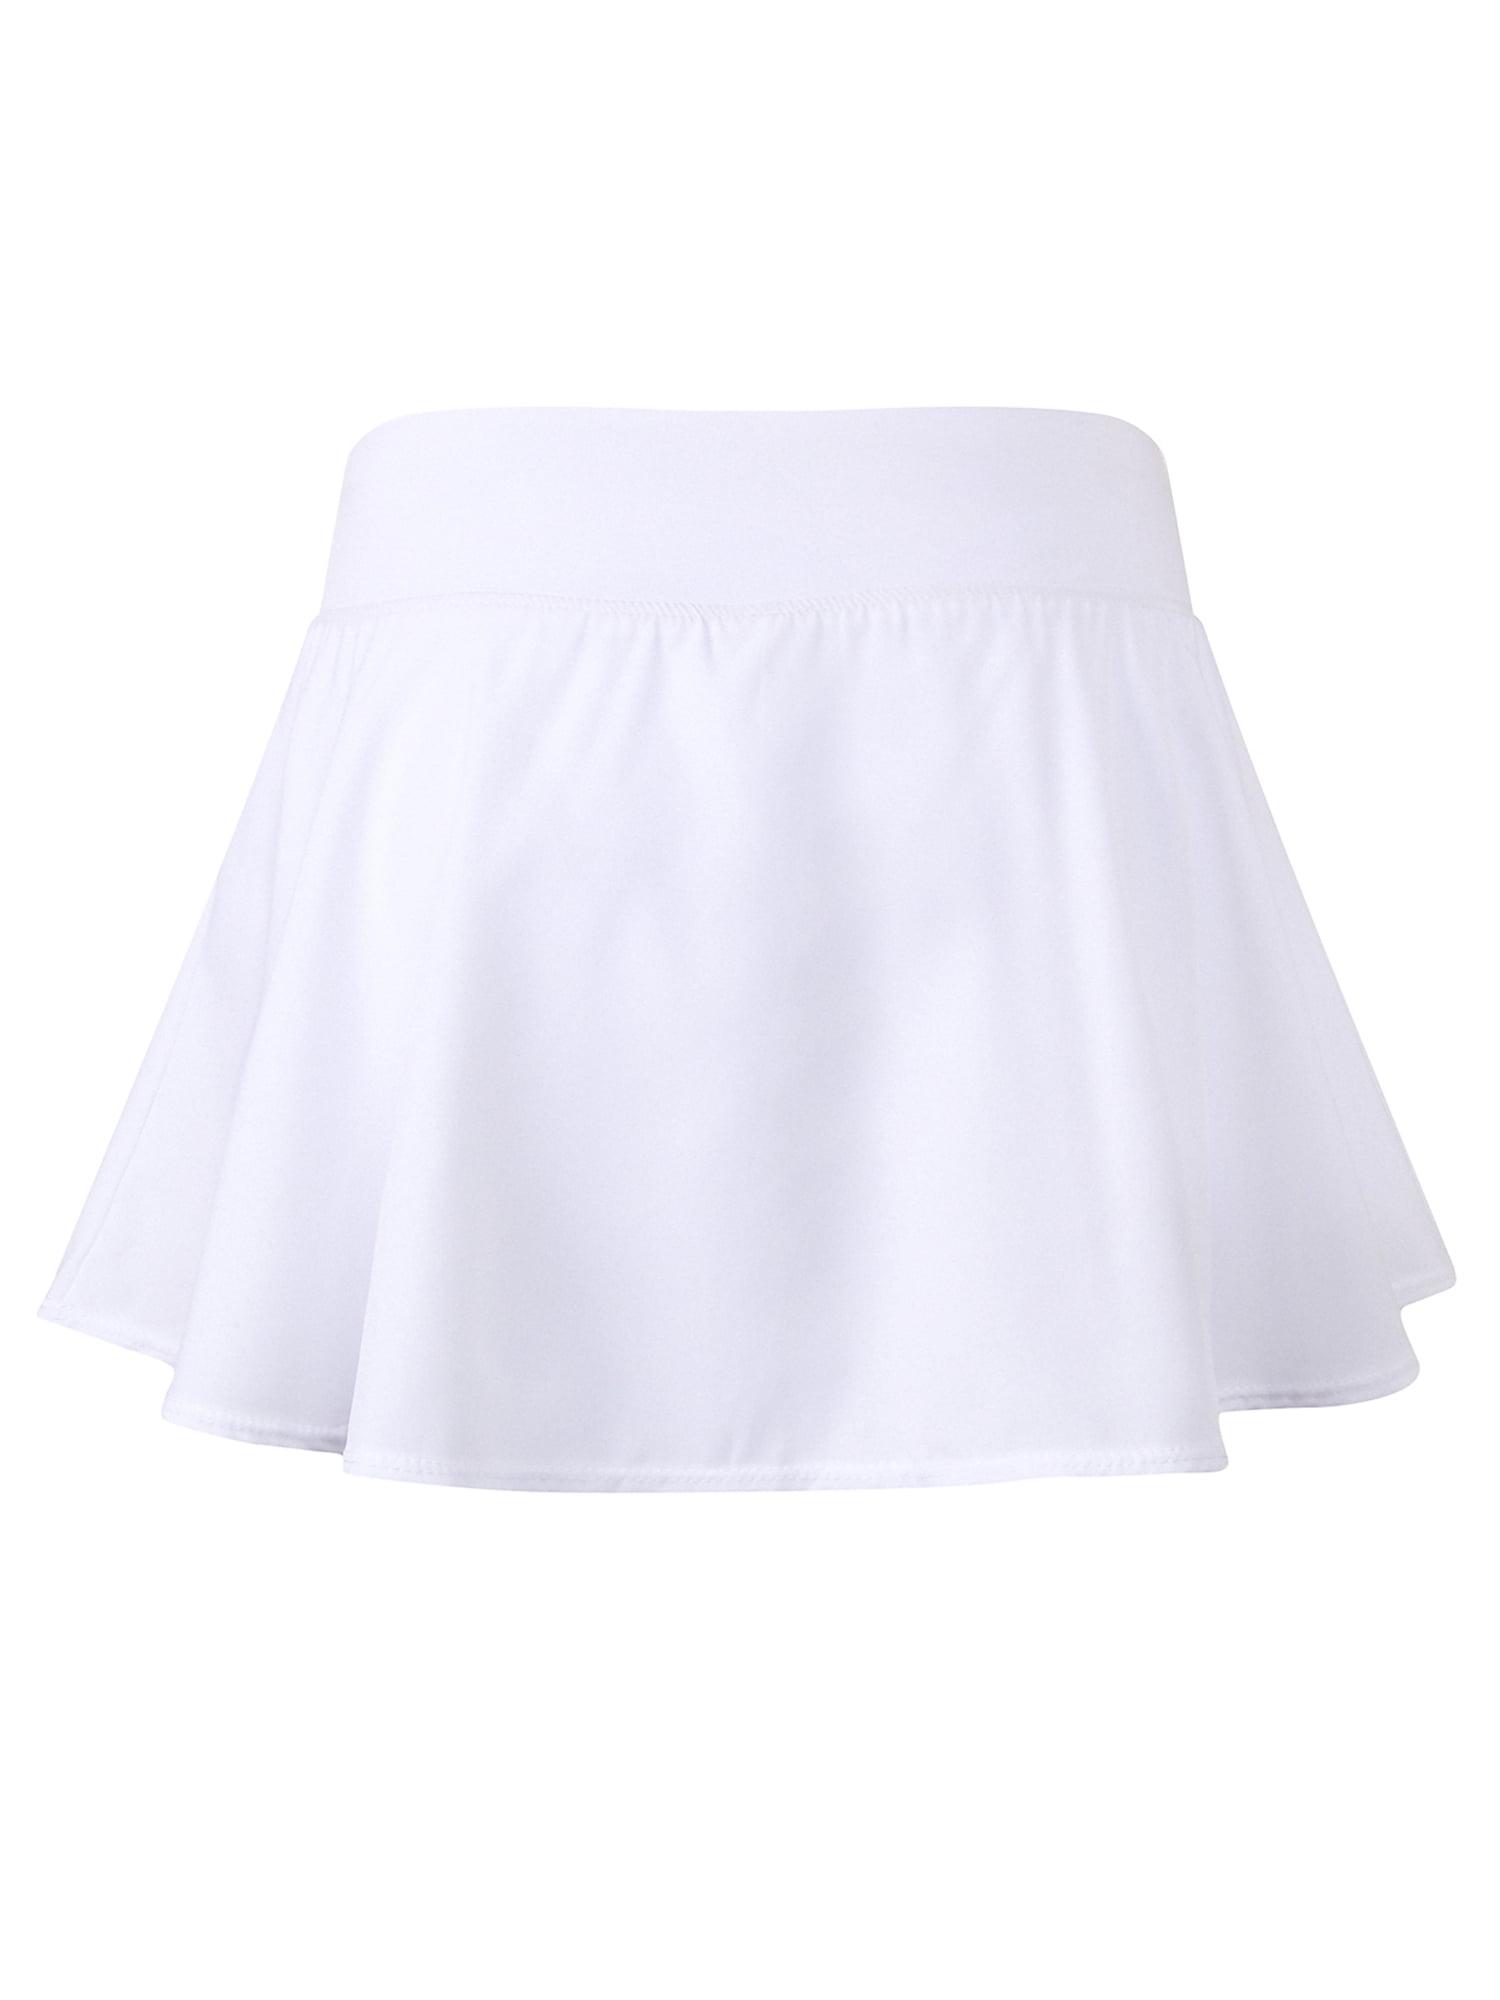 Plus Size Ladies Women Girls Running Tennis Skirts Pleated Golf Skort  Sports Yoga Shorts Short Skirt Solid High Waist Active Wear Gym Fitness  Jogging Workout White L - Walmart.com - Walmart.com